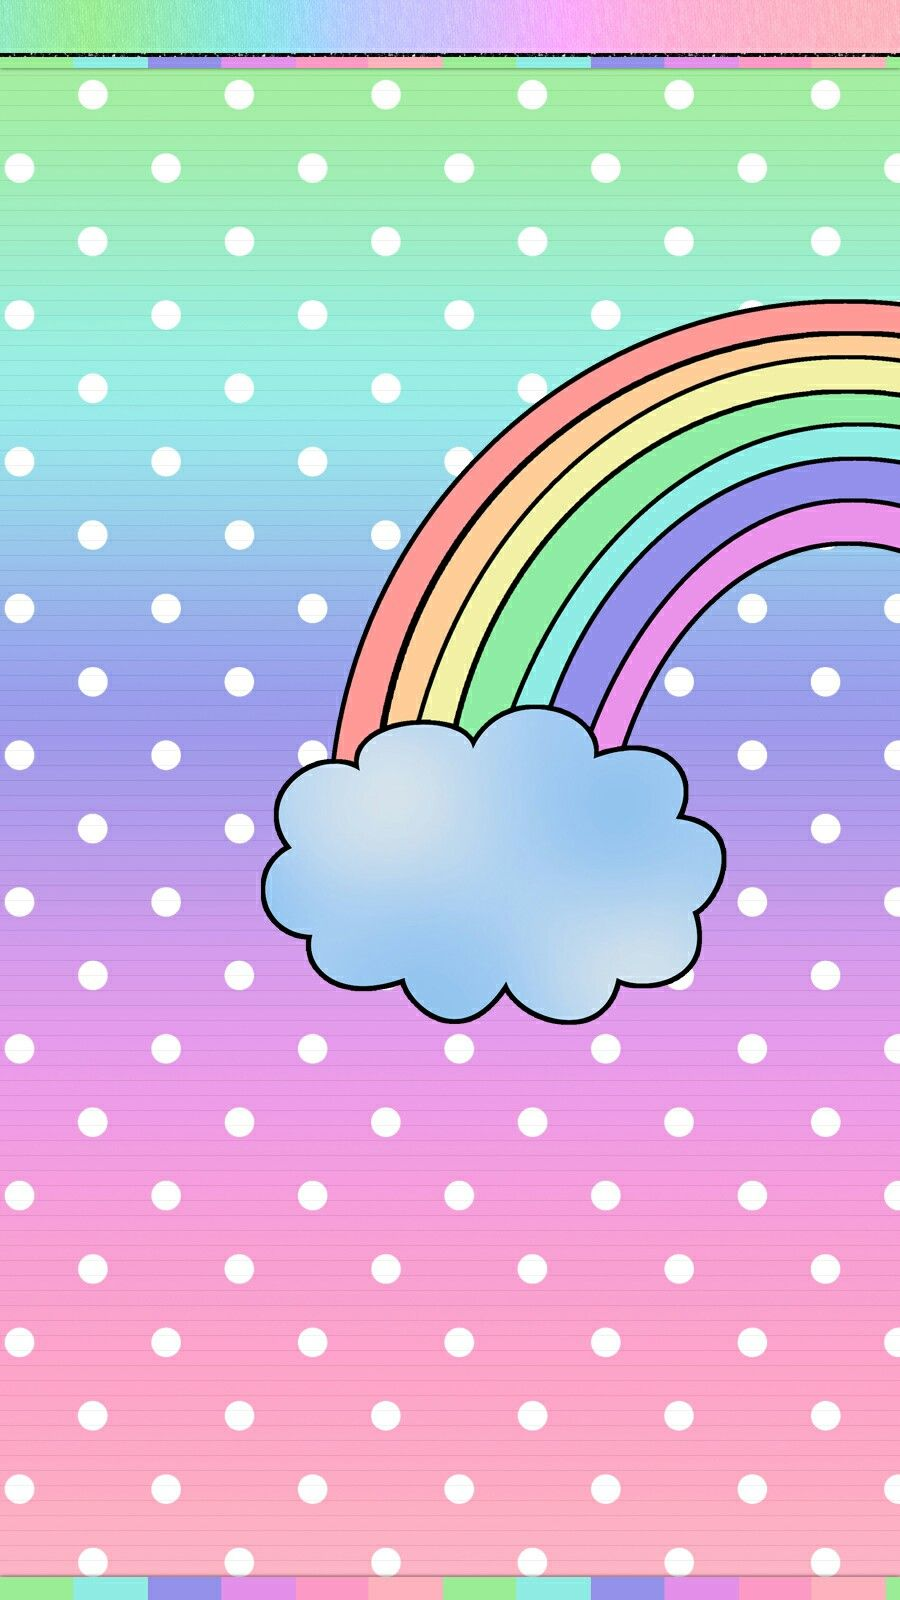 Rainbow Wallpaper Iphone Rainbow Wallpaper Hello Kitty Wallpaper Wallpaper Iphone Cute